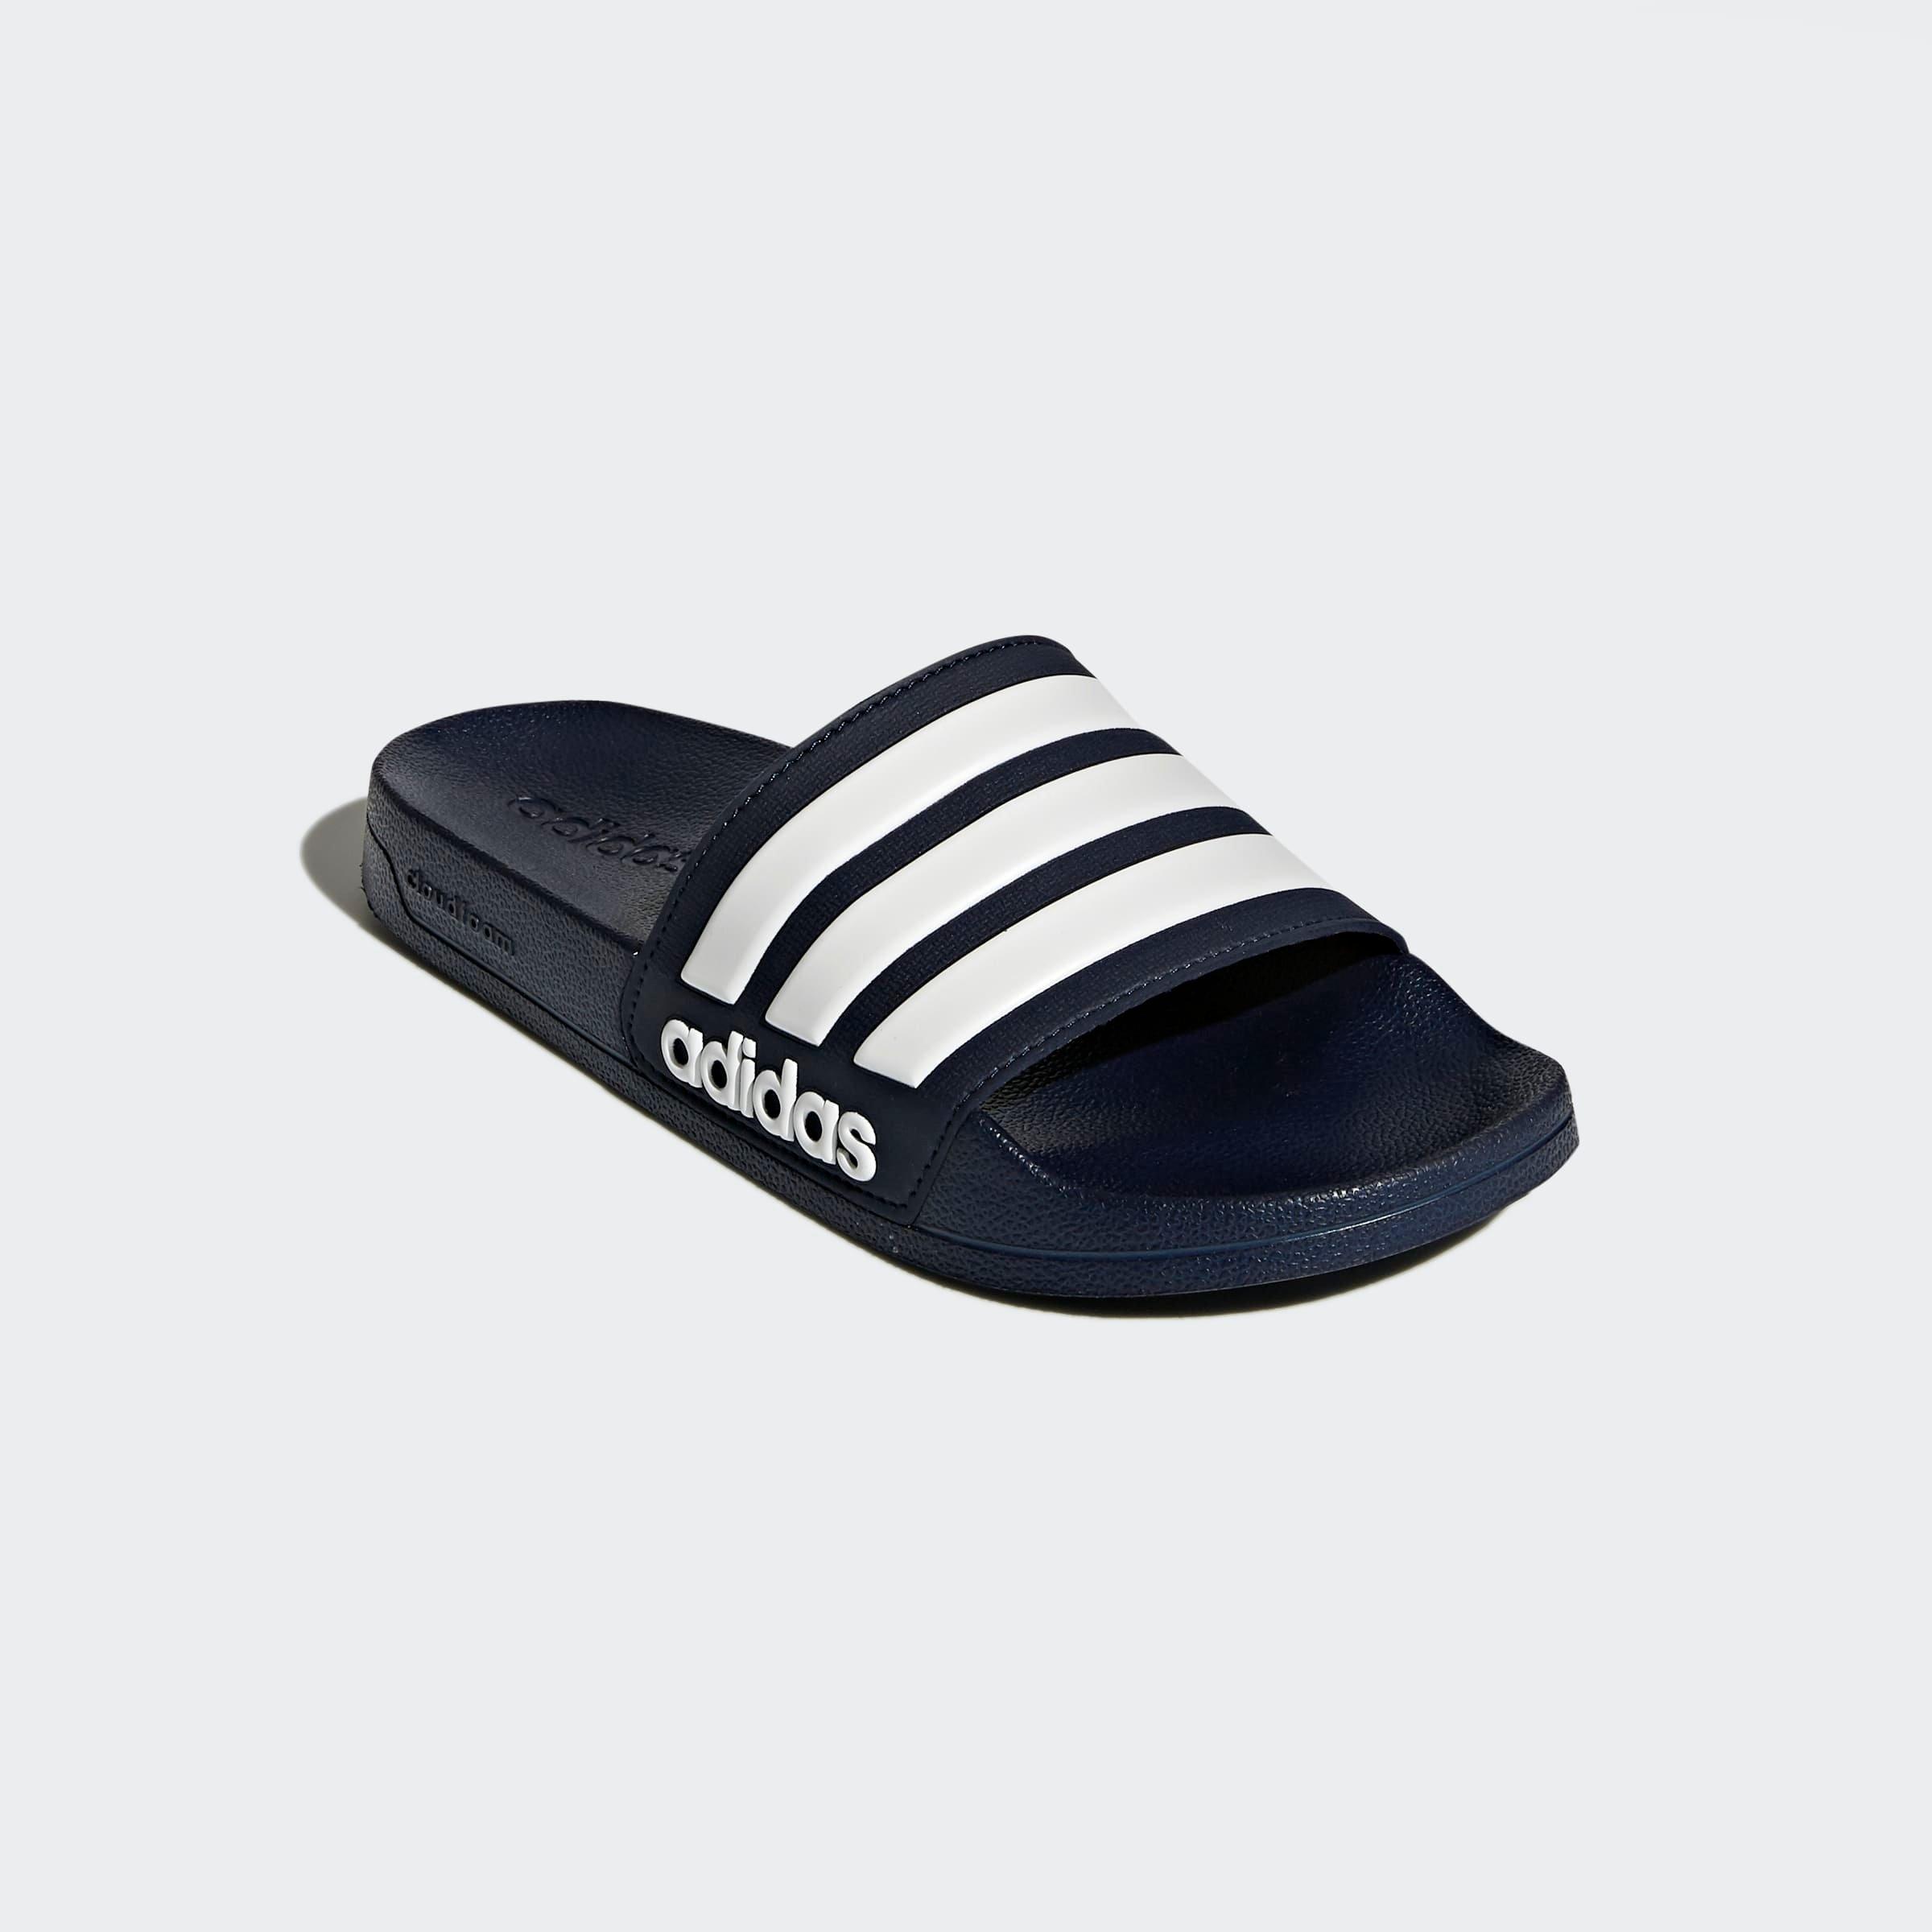 adidas badslippers »ADILETTE SHOWER« nu online bestellen